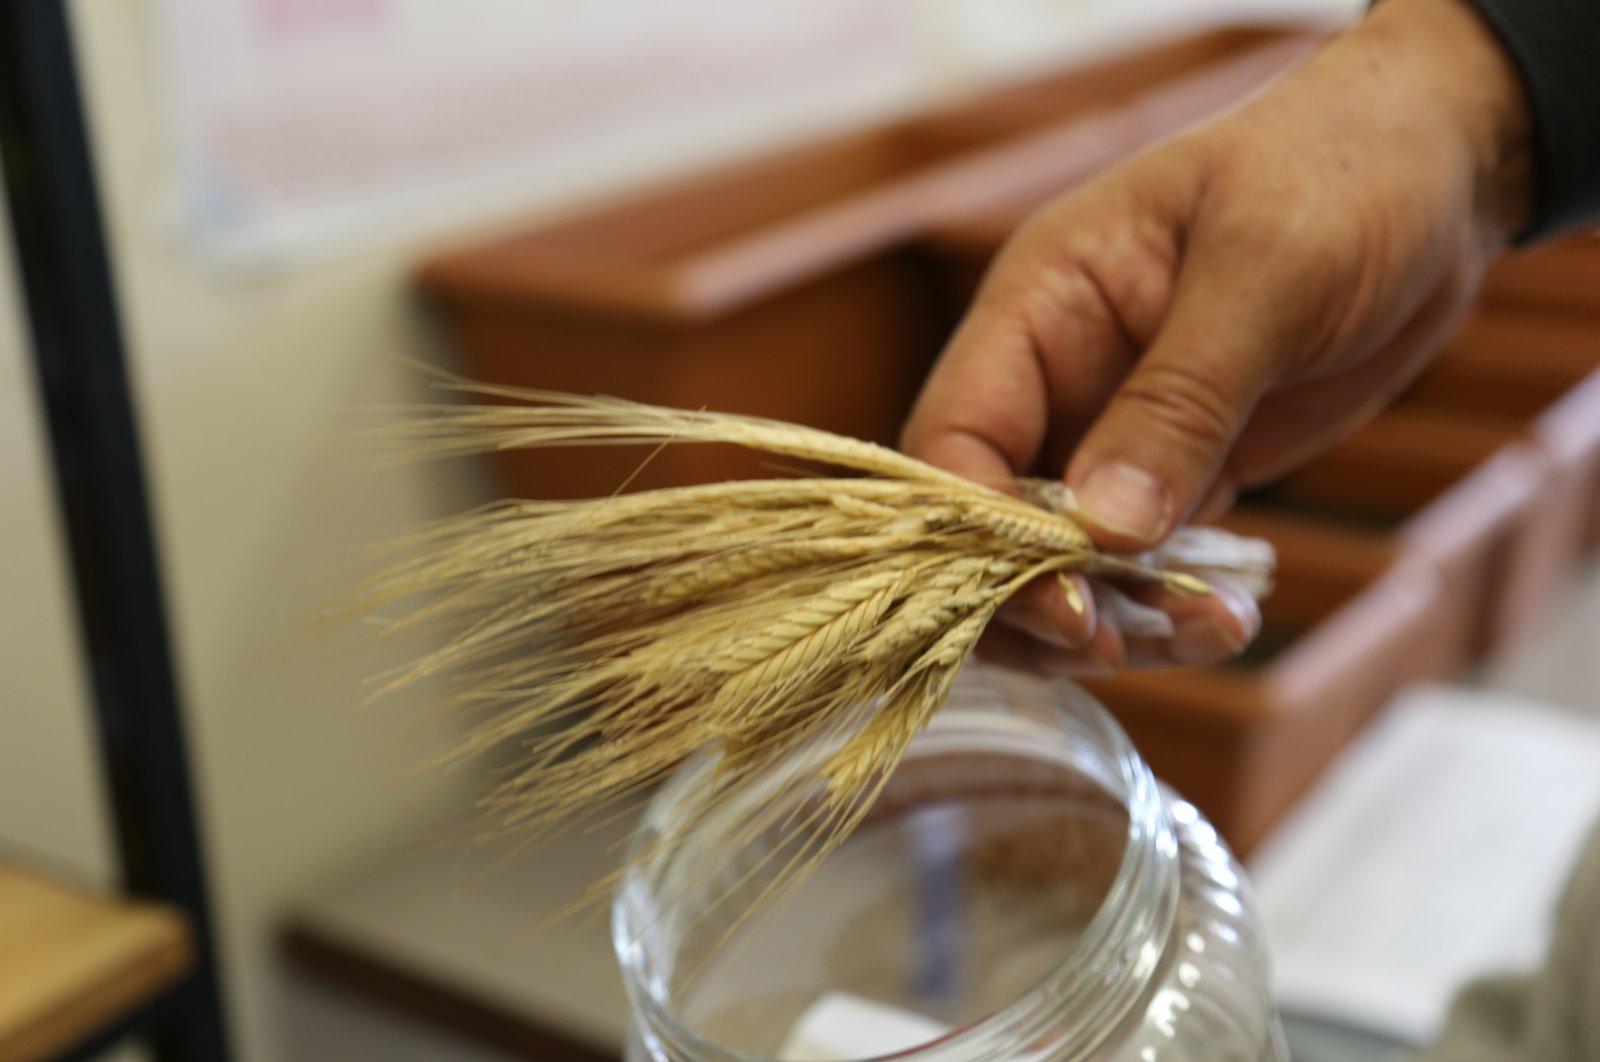 Iza wheat produced in a laboratory, in Bolu, northern Turkey, April 2, 2021. (AA PHOTO)